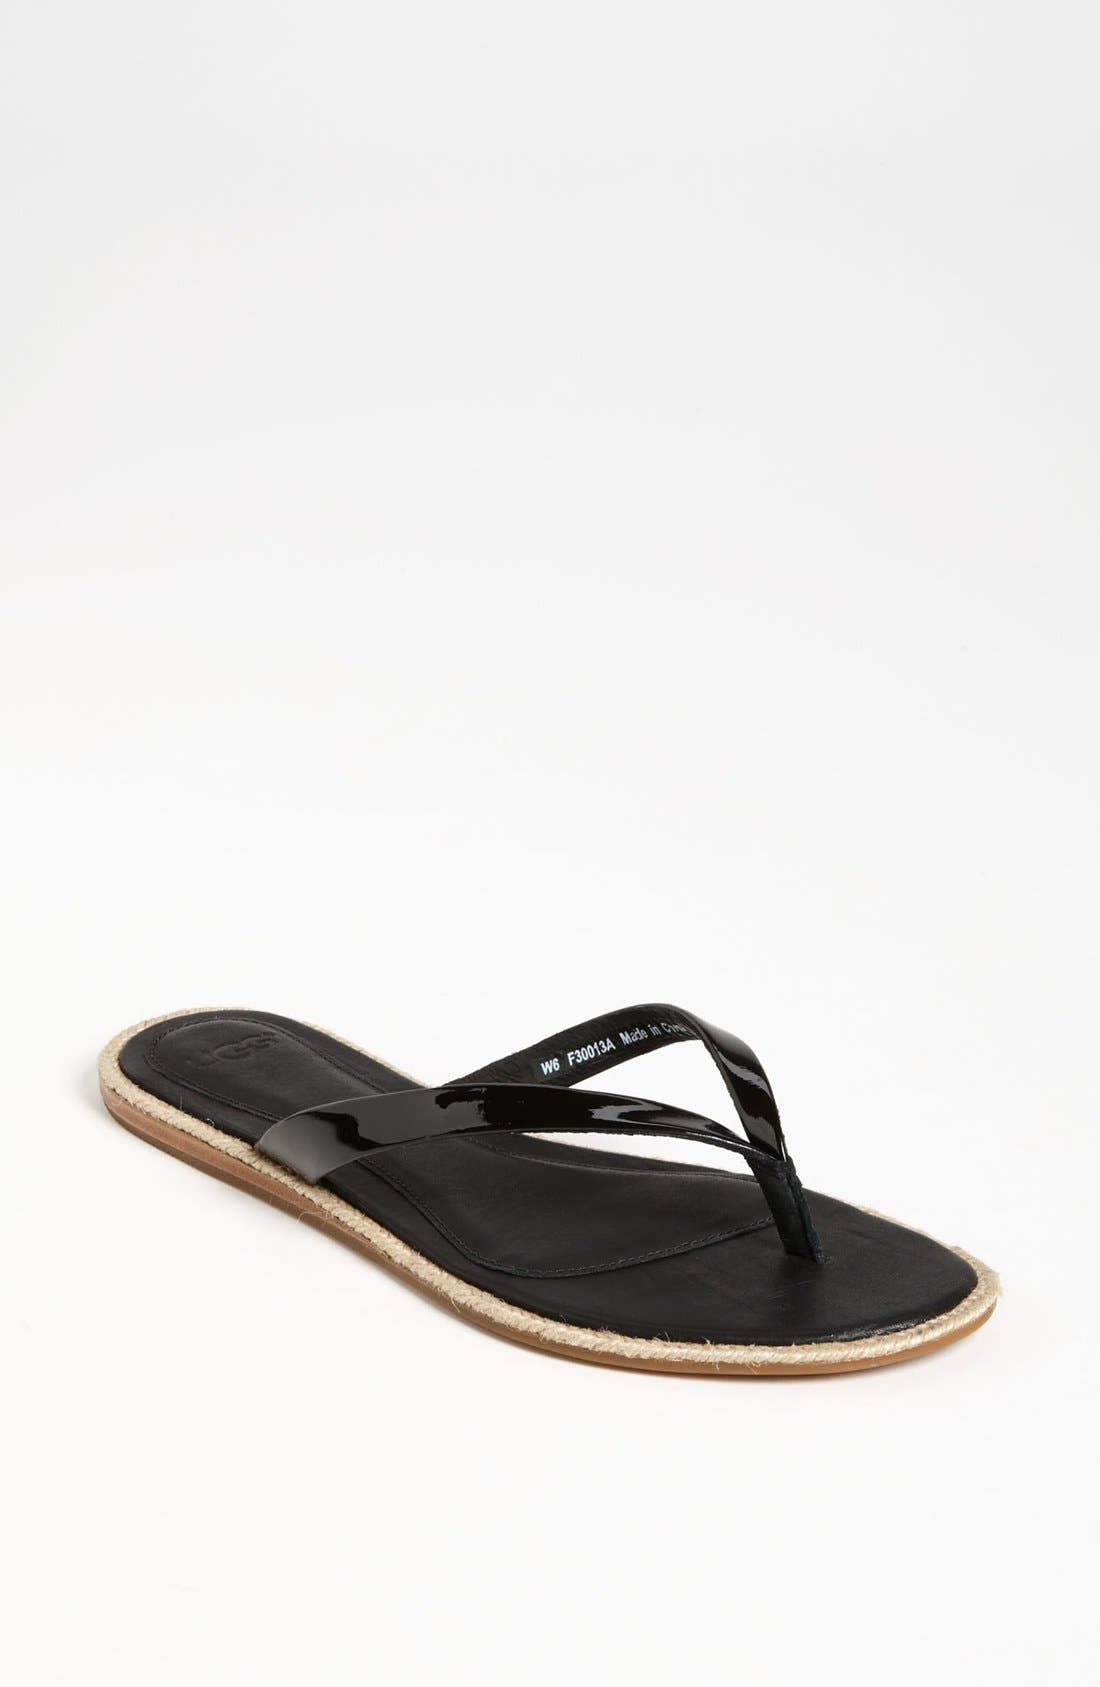 Main Image - UGG® Australia 'Allaria' Flip Flop (Women)